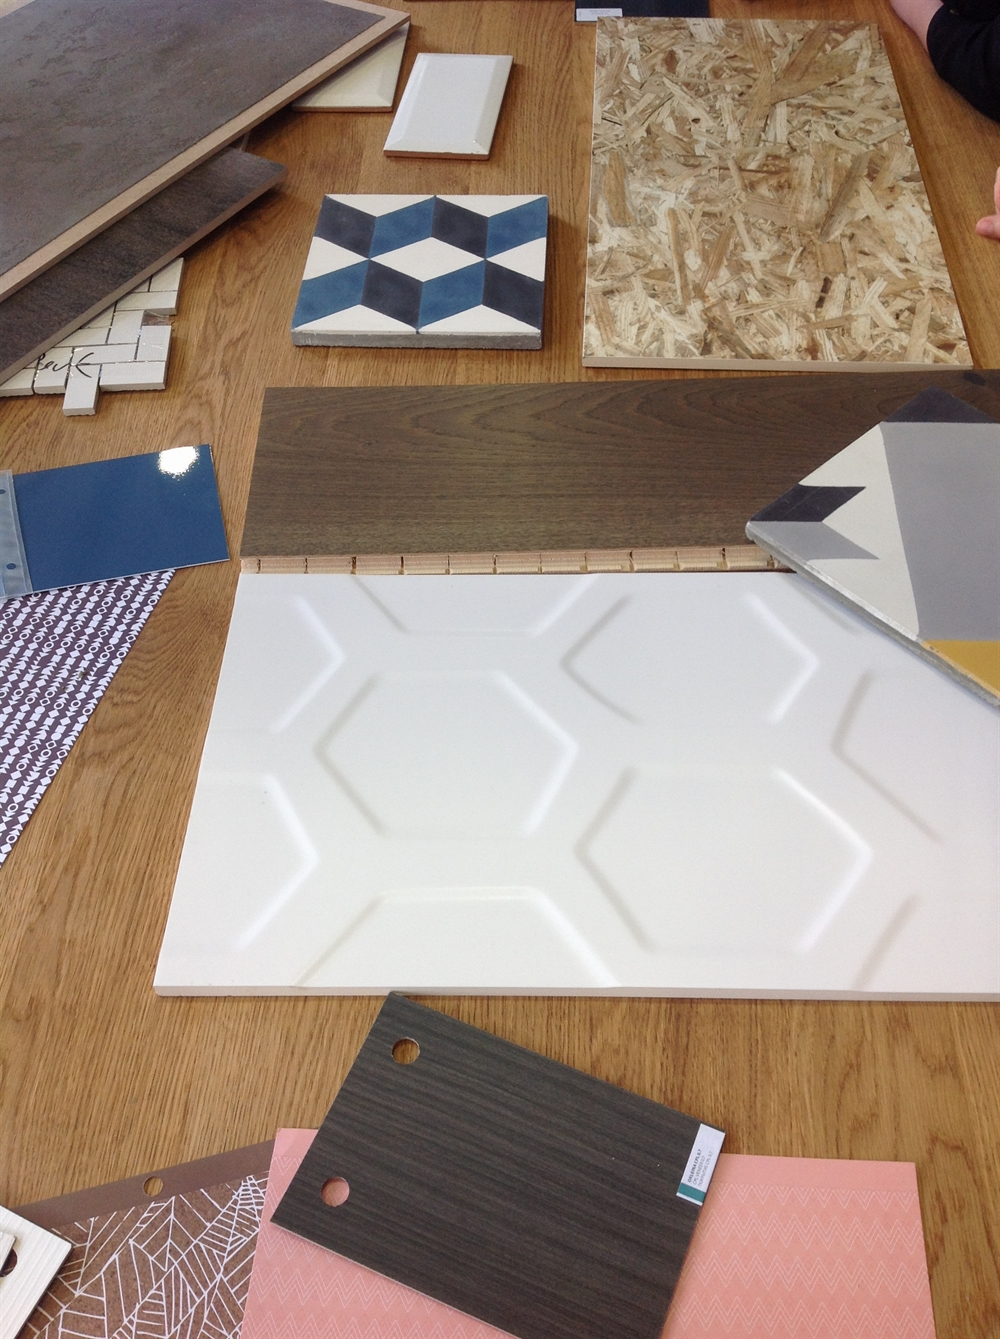 12 bloggirls decoroom warsztaty aranzacji projektowanie wnetrz interior design workshops apartment arrangement home ideas